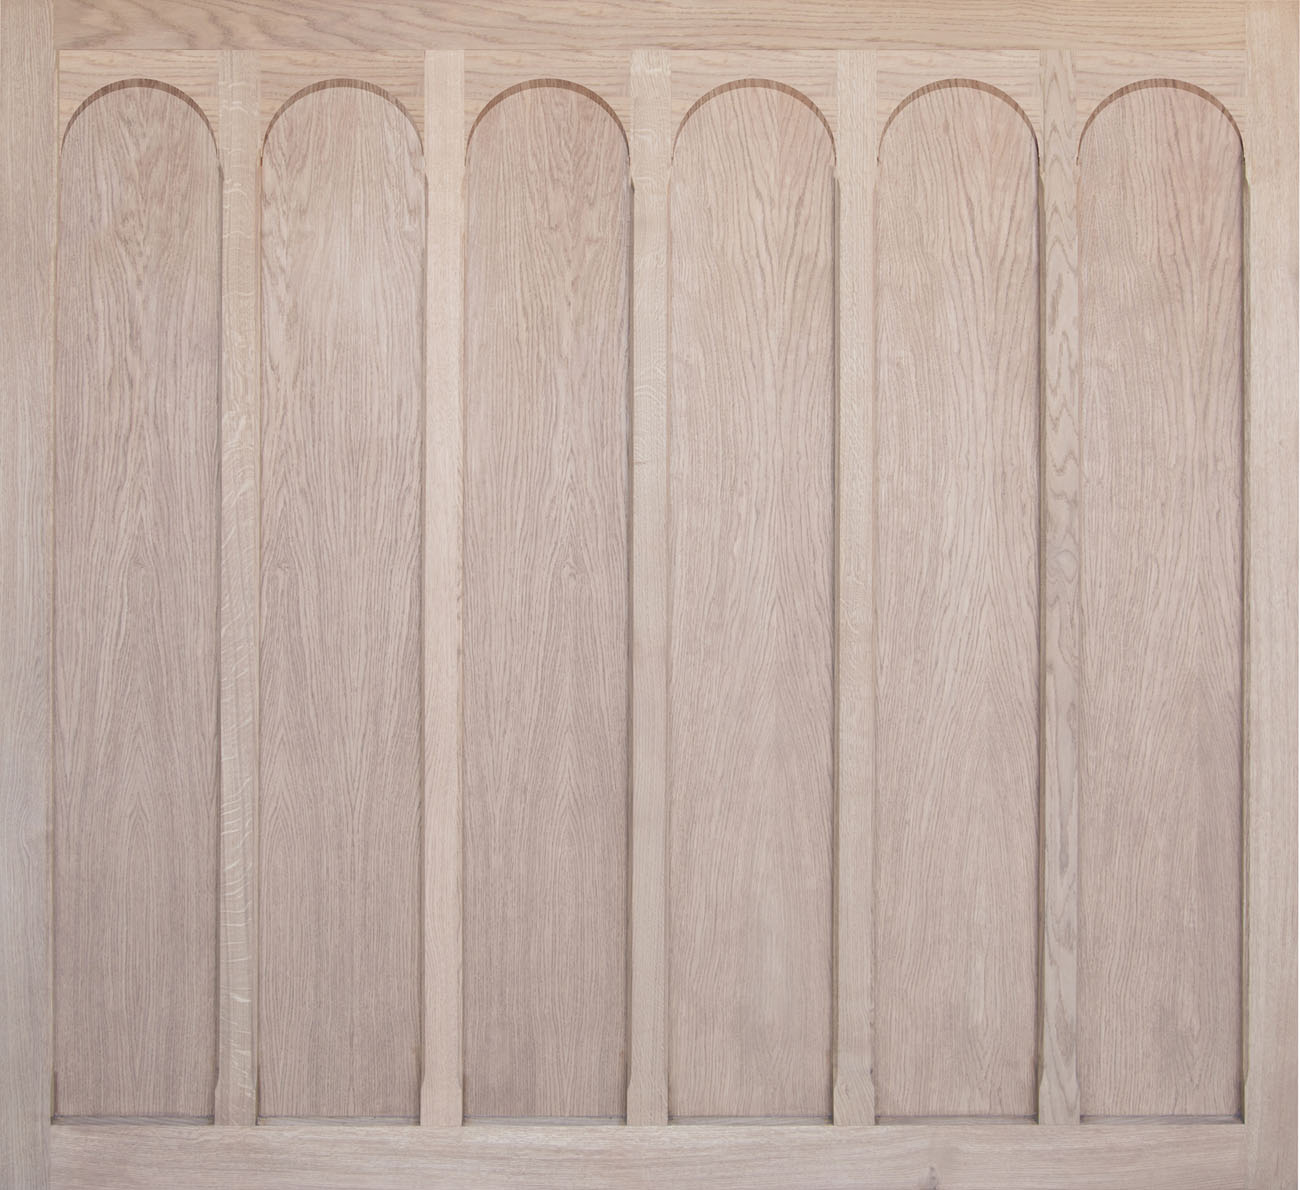 Sevenoak panel-built